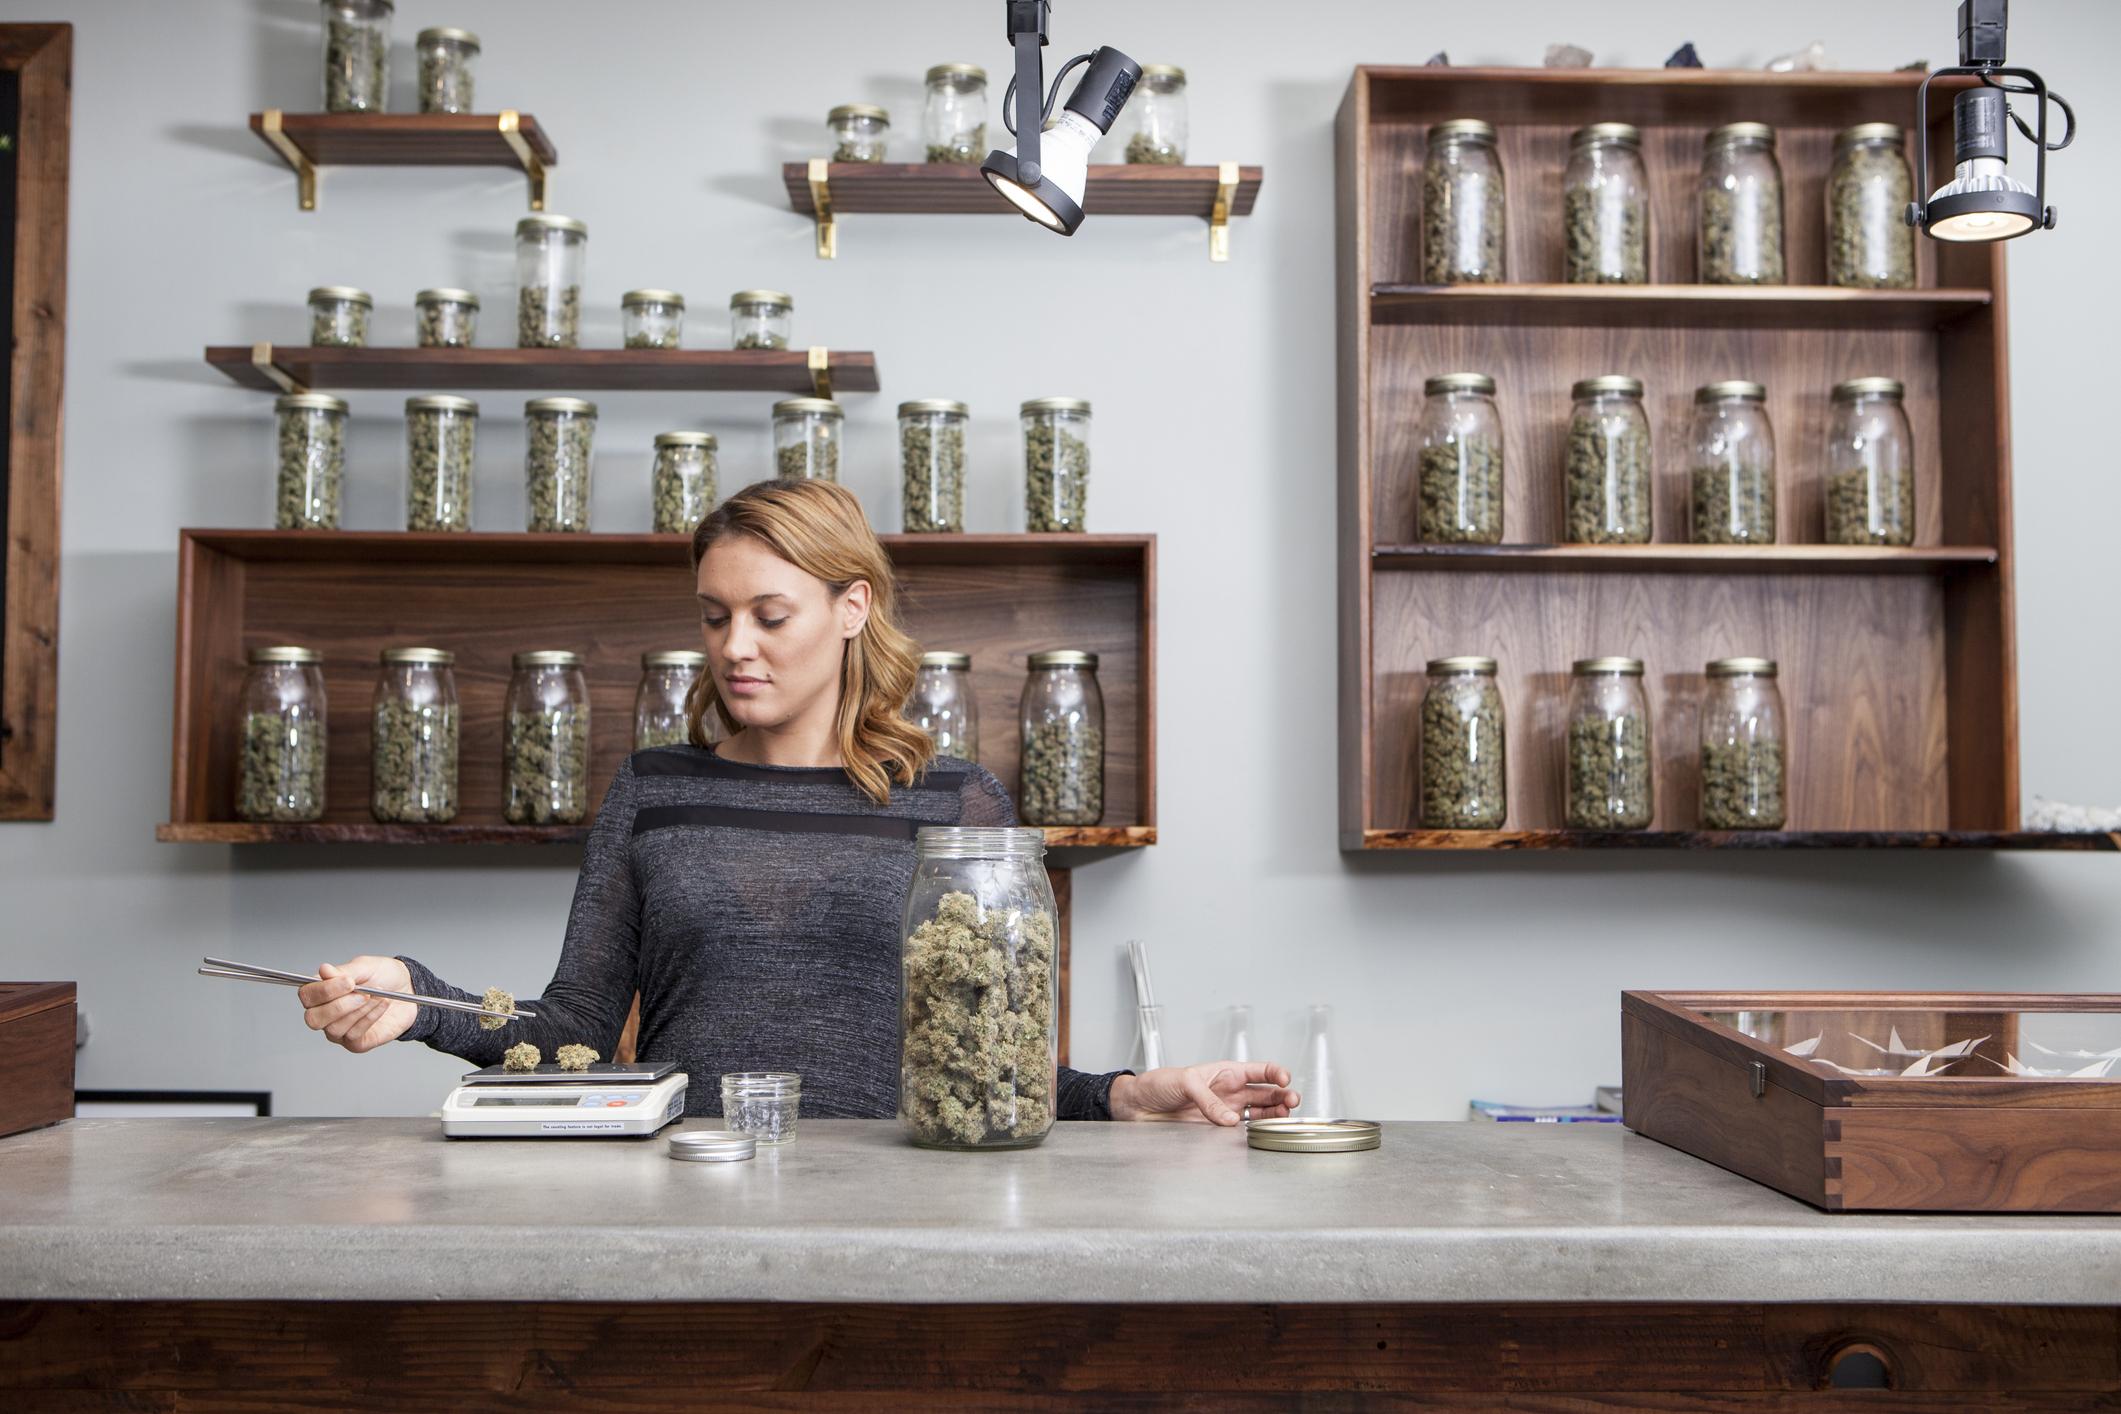 Can Marijuana Stocks Survive Legalization?